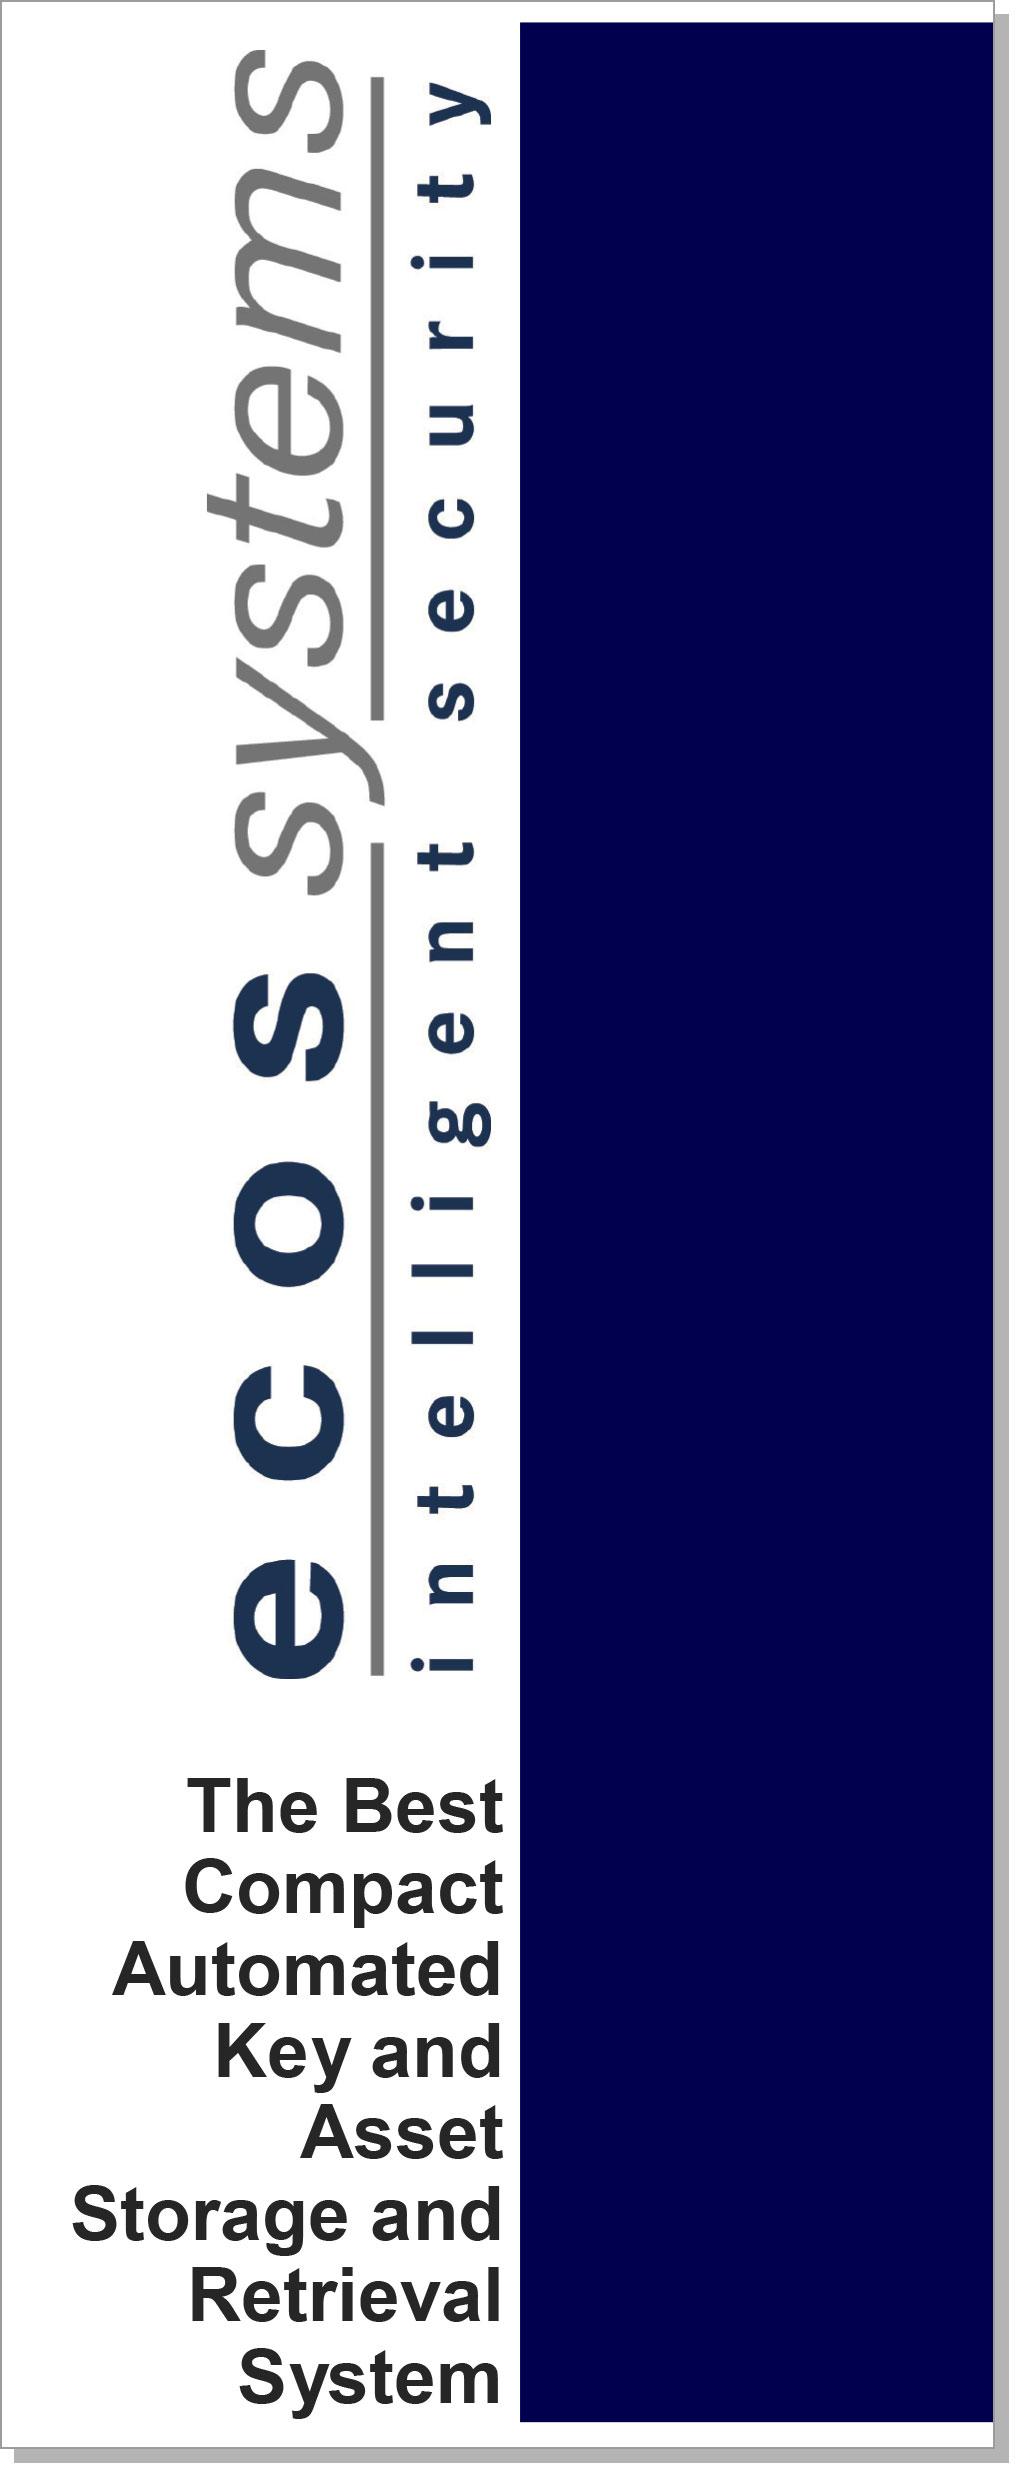 FLYERS-ECOS-EN_WAS-081318-1.jpg